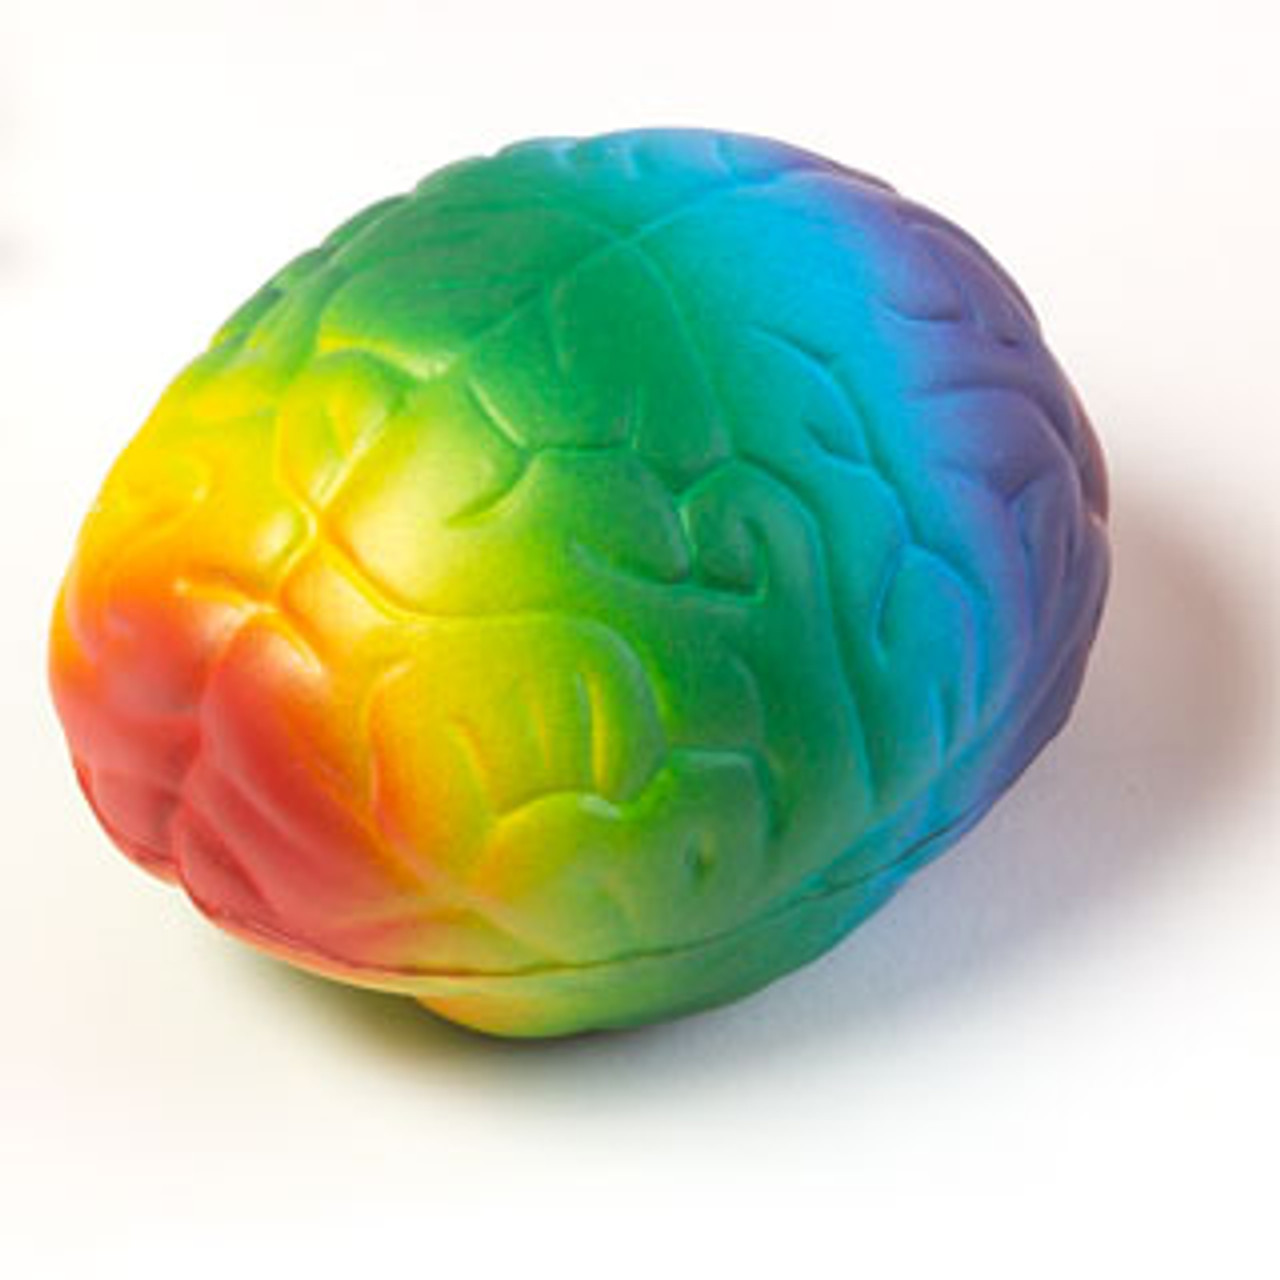 Brain Stress ball - side angle view